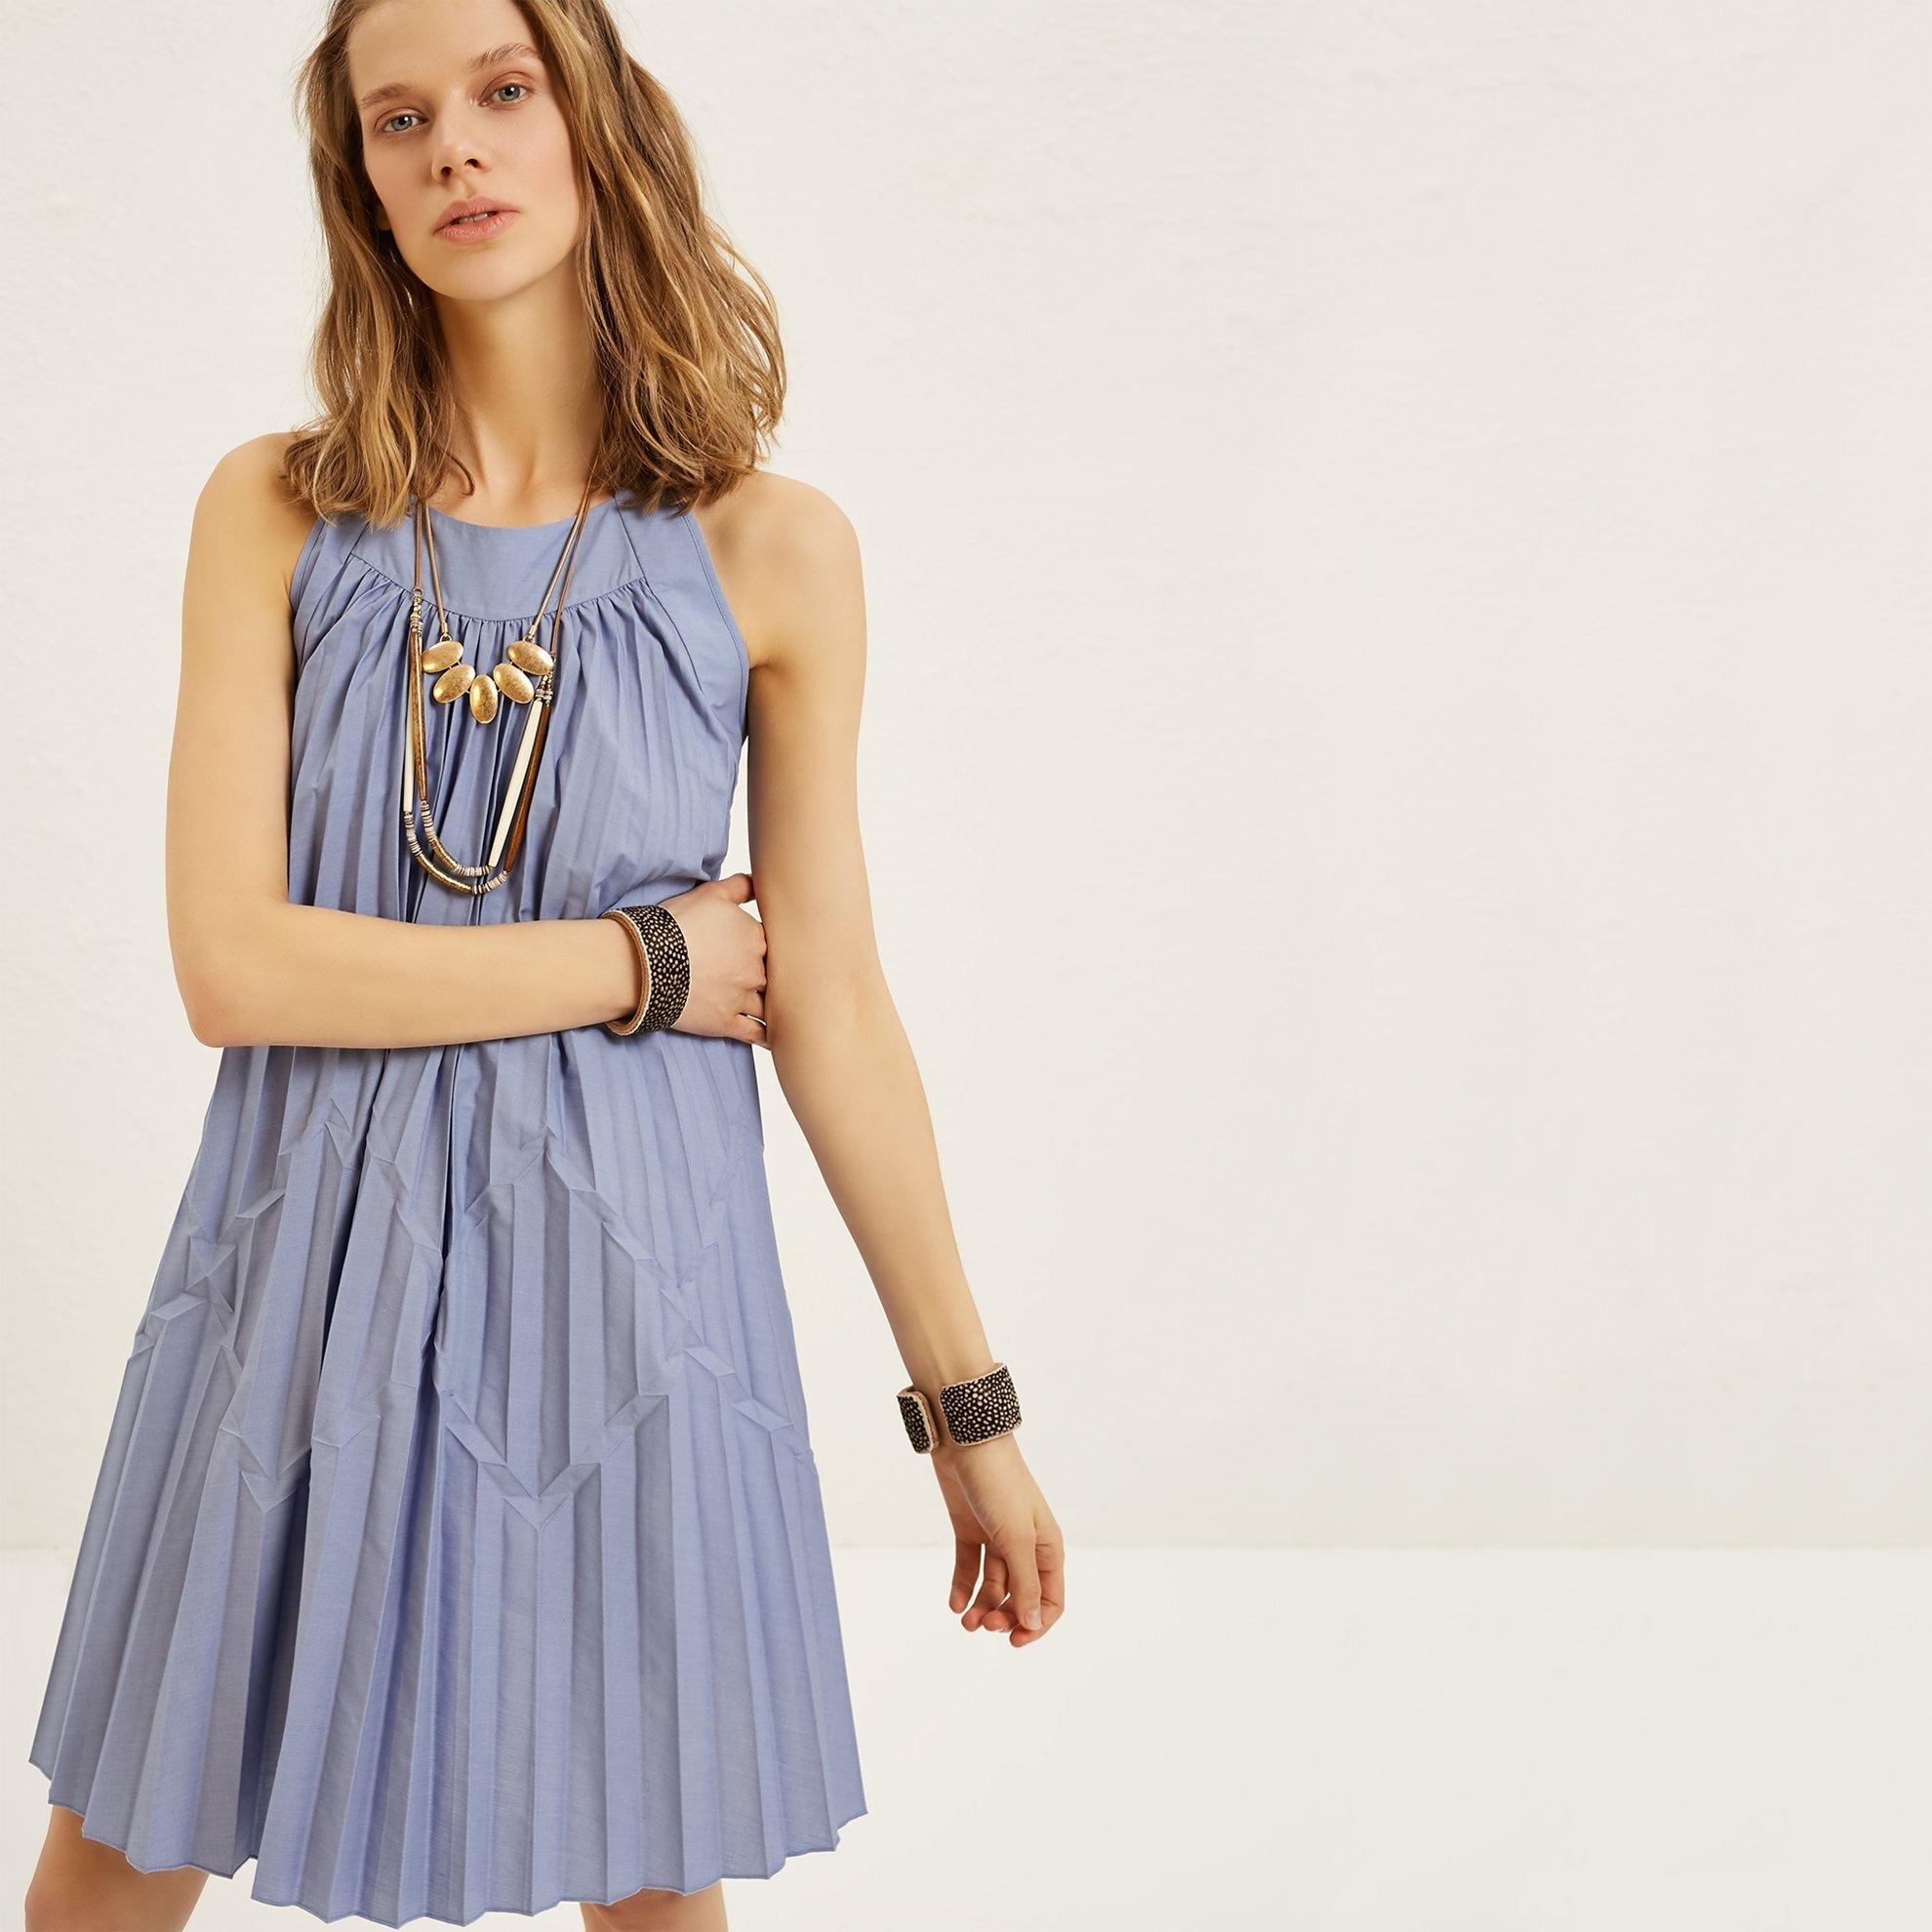 77ea00080f2e1 Mavi Plili Kolsuz Elbise - Yargıcı